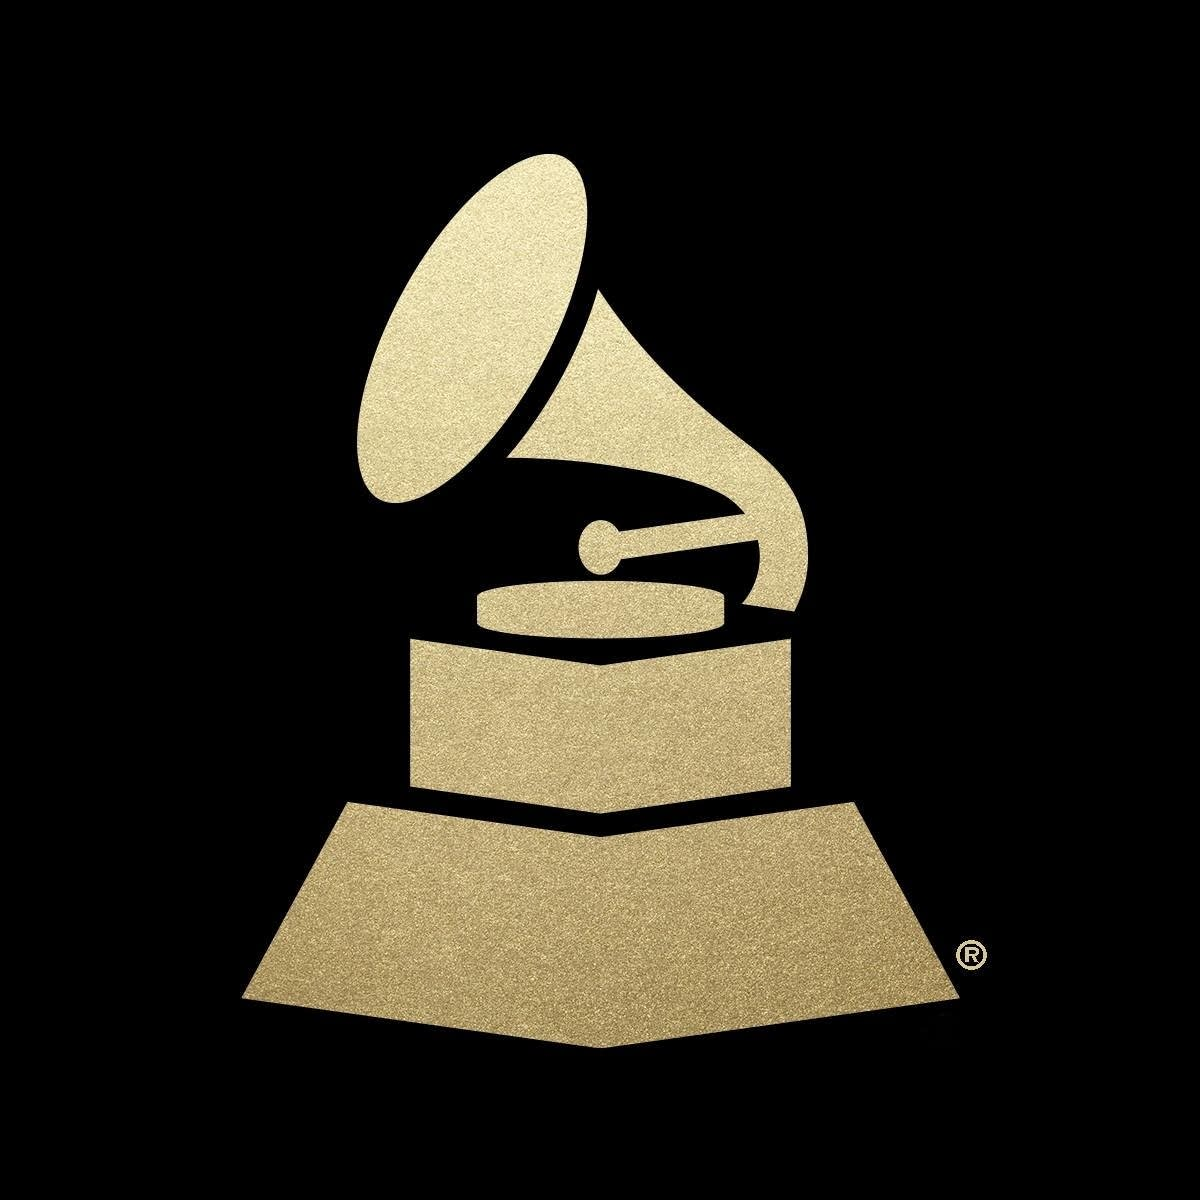 The Grammys 2016 logo